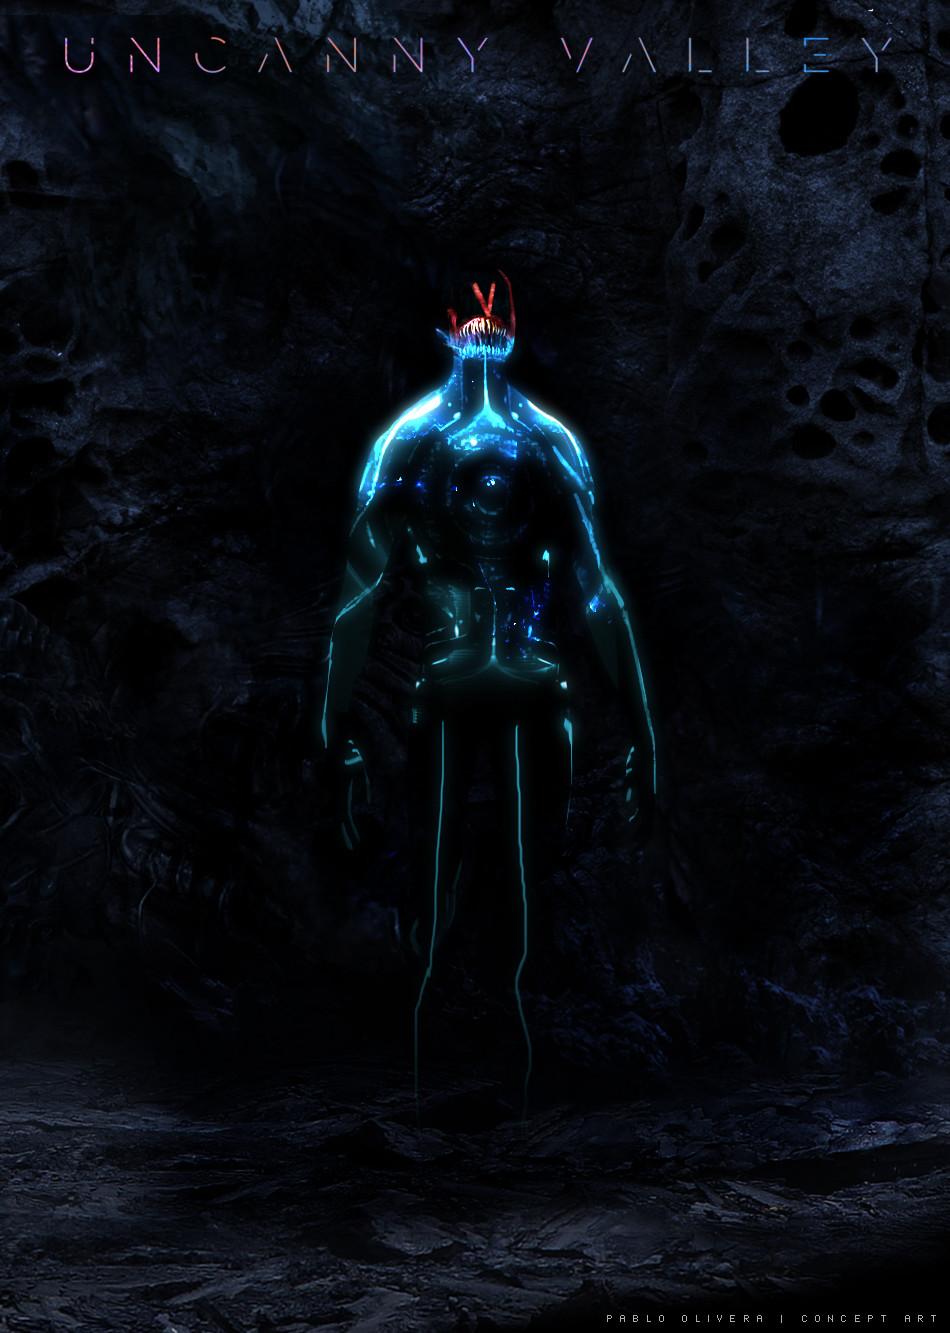 Pablo olivera uncanny valley character design alien 08